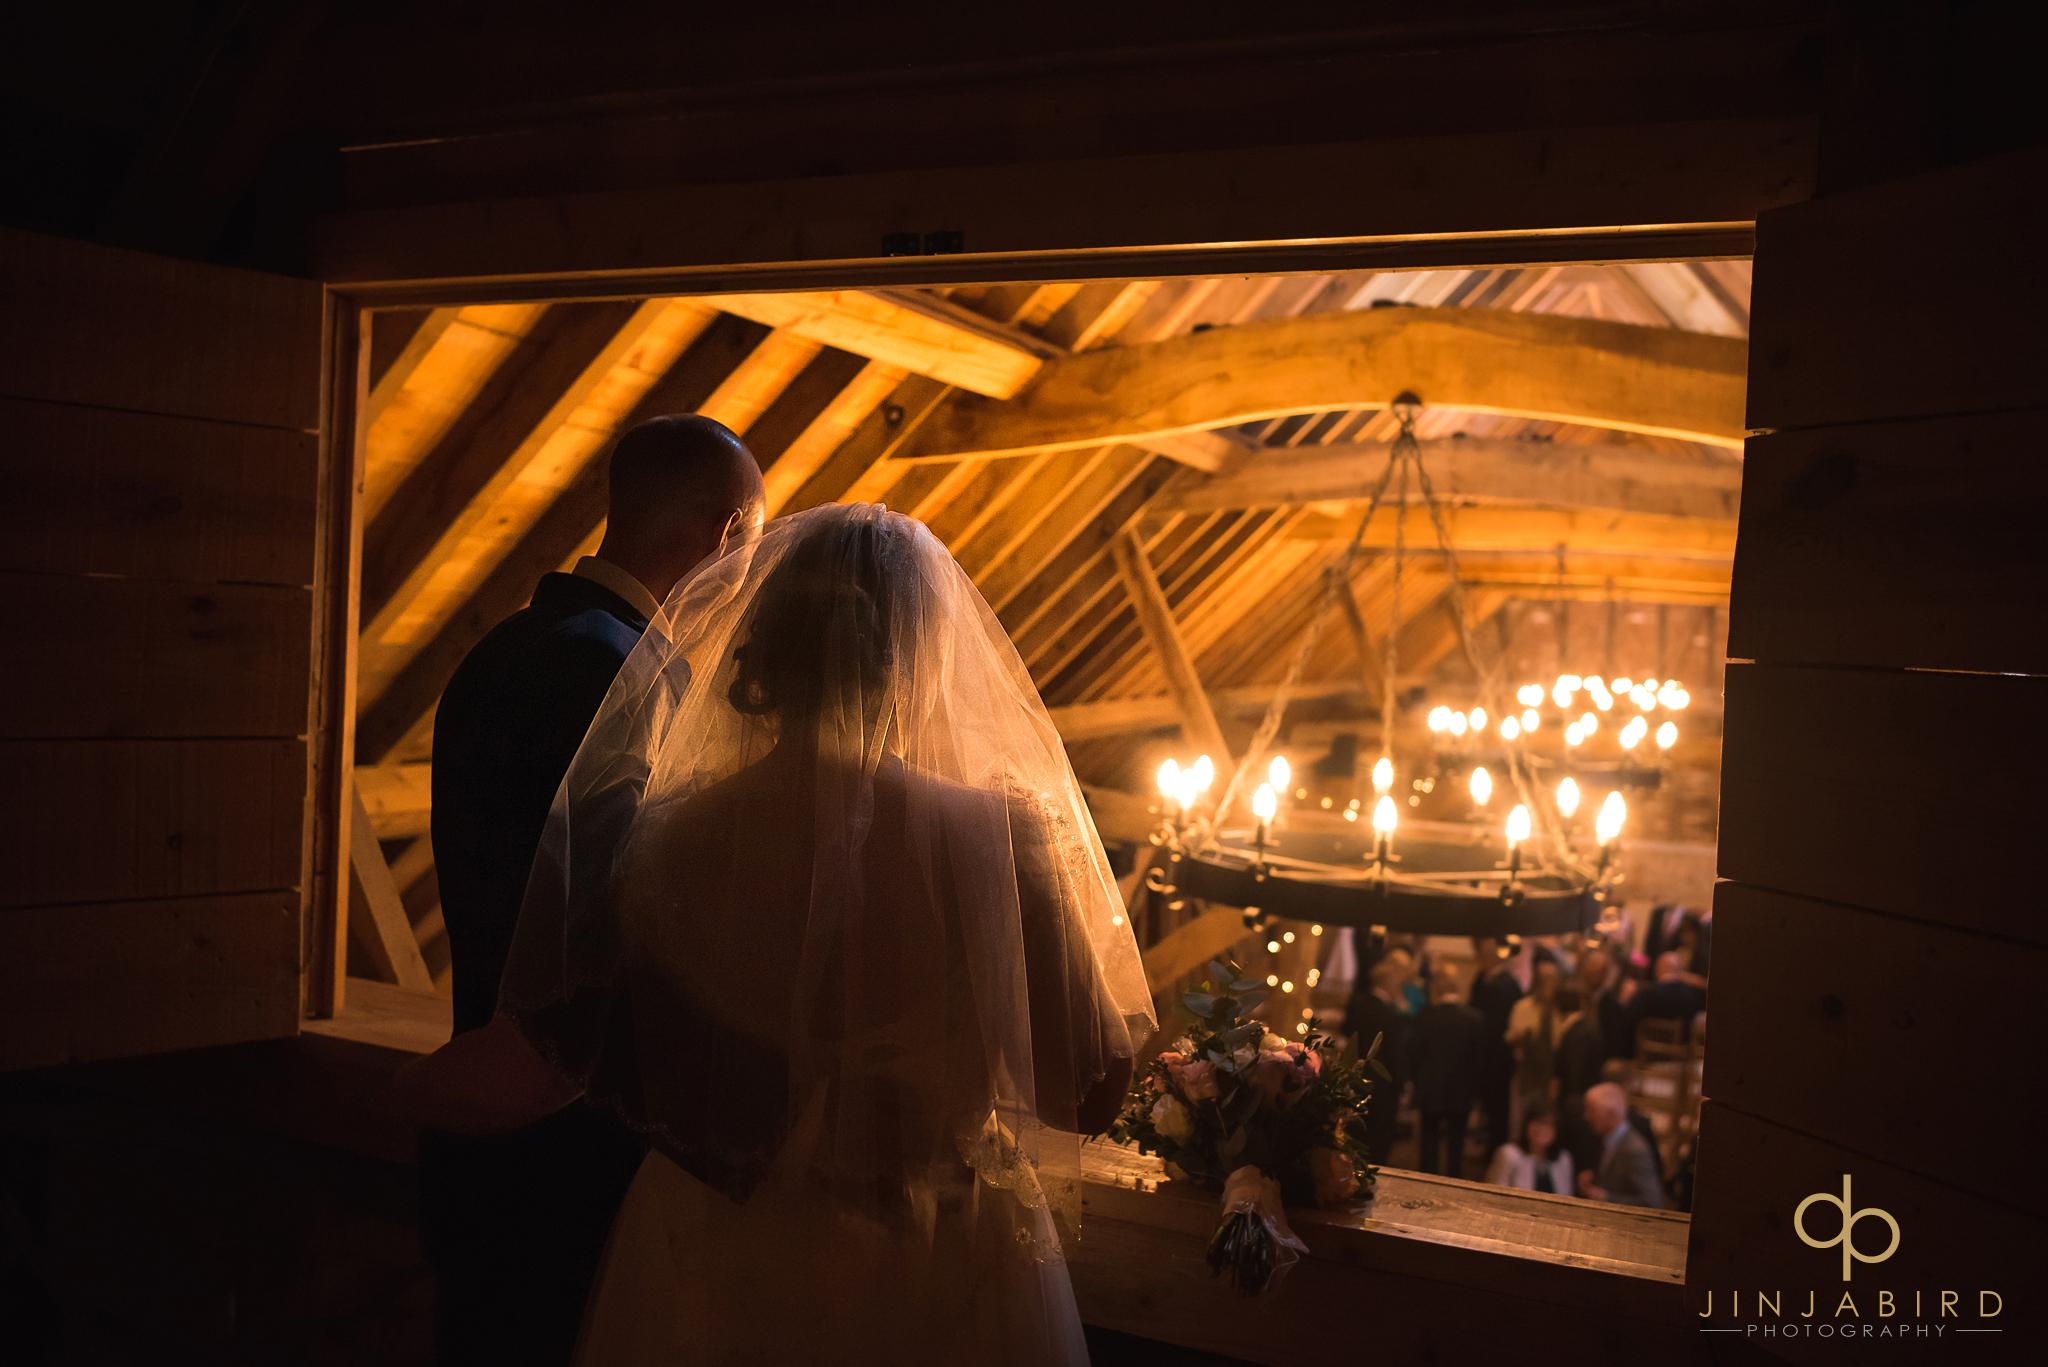 bride-and-groom-in-gallery-rickety-barn-bassmead